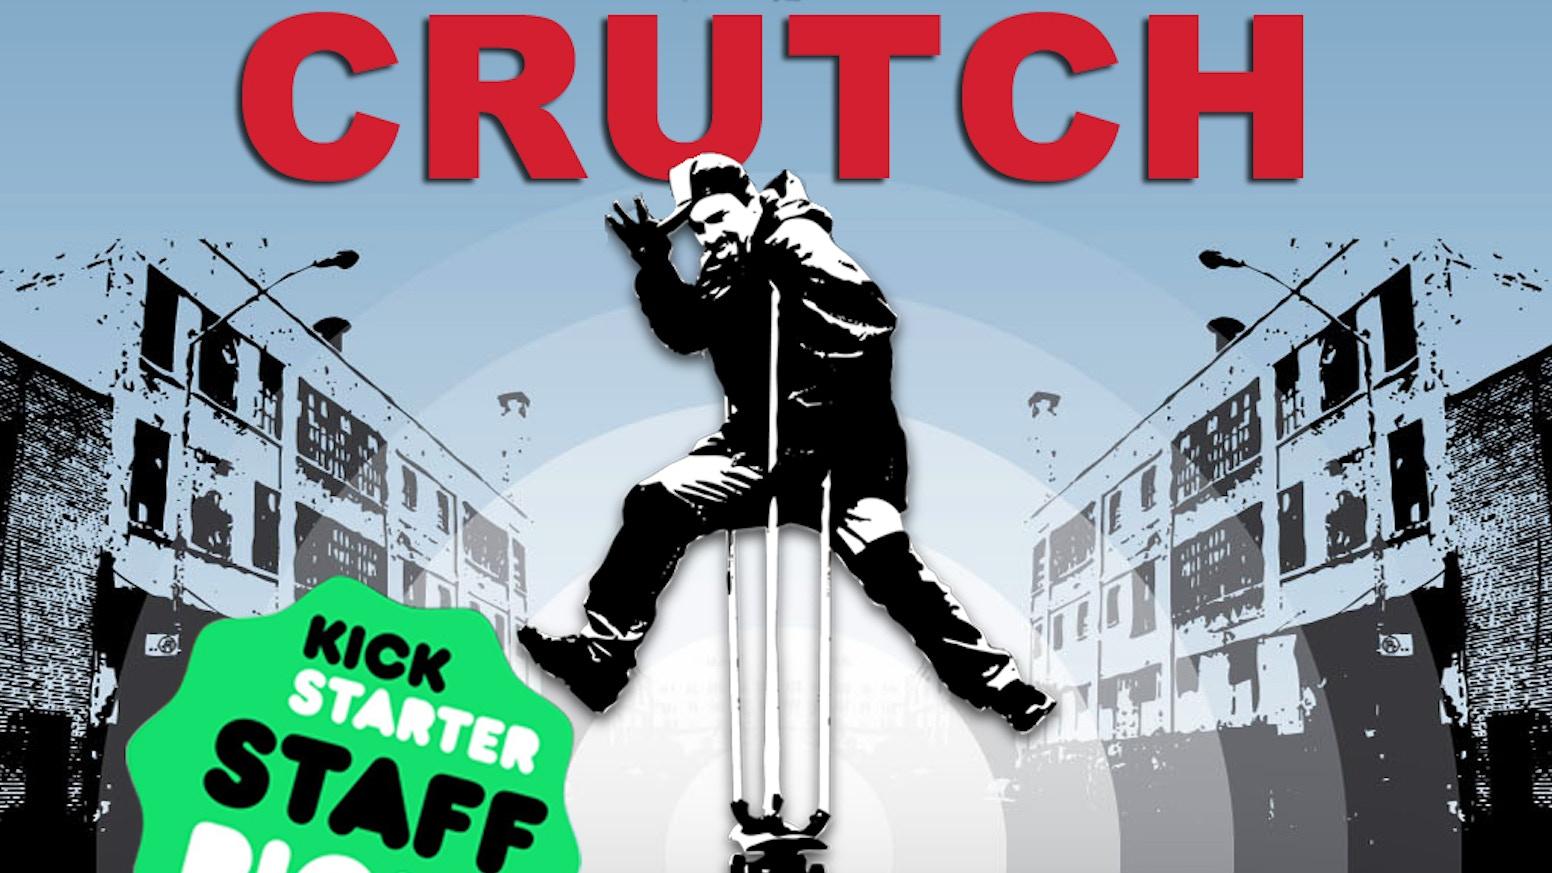 CRUTCH a documentary film by Sachi Cunningham & Chandler Evans